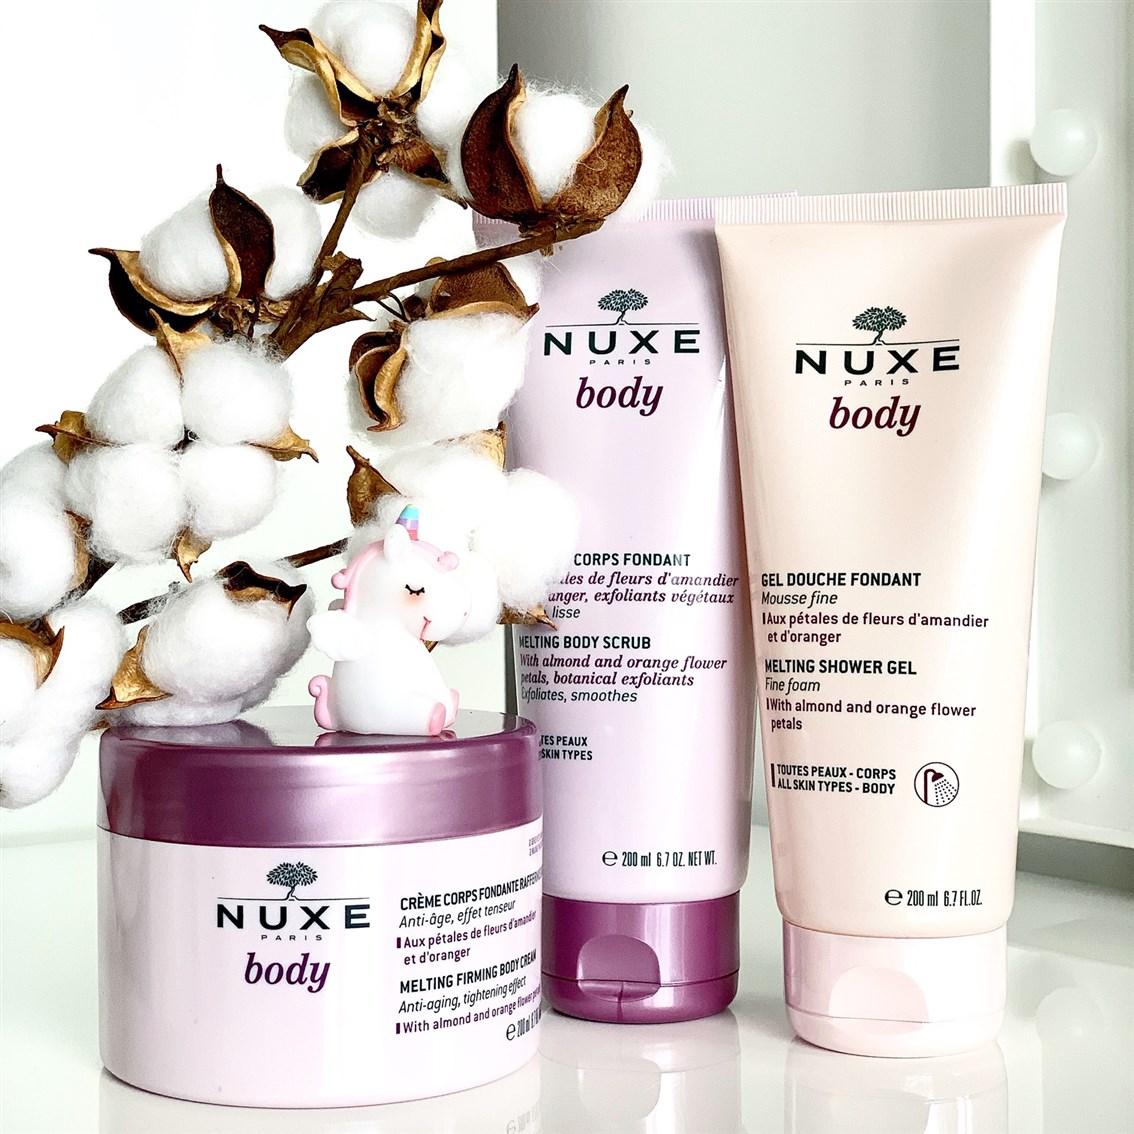 NUXE Body kosmetyki opinie blog